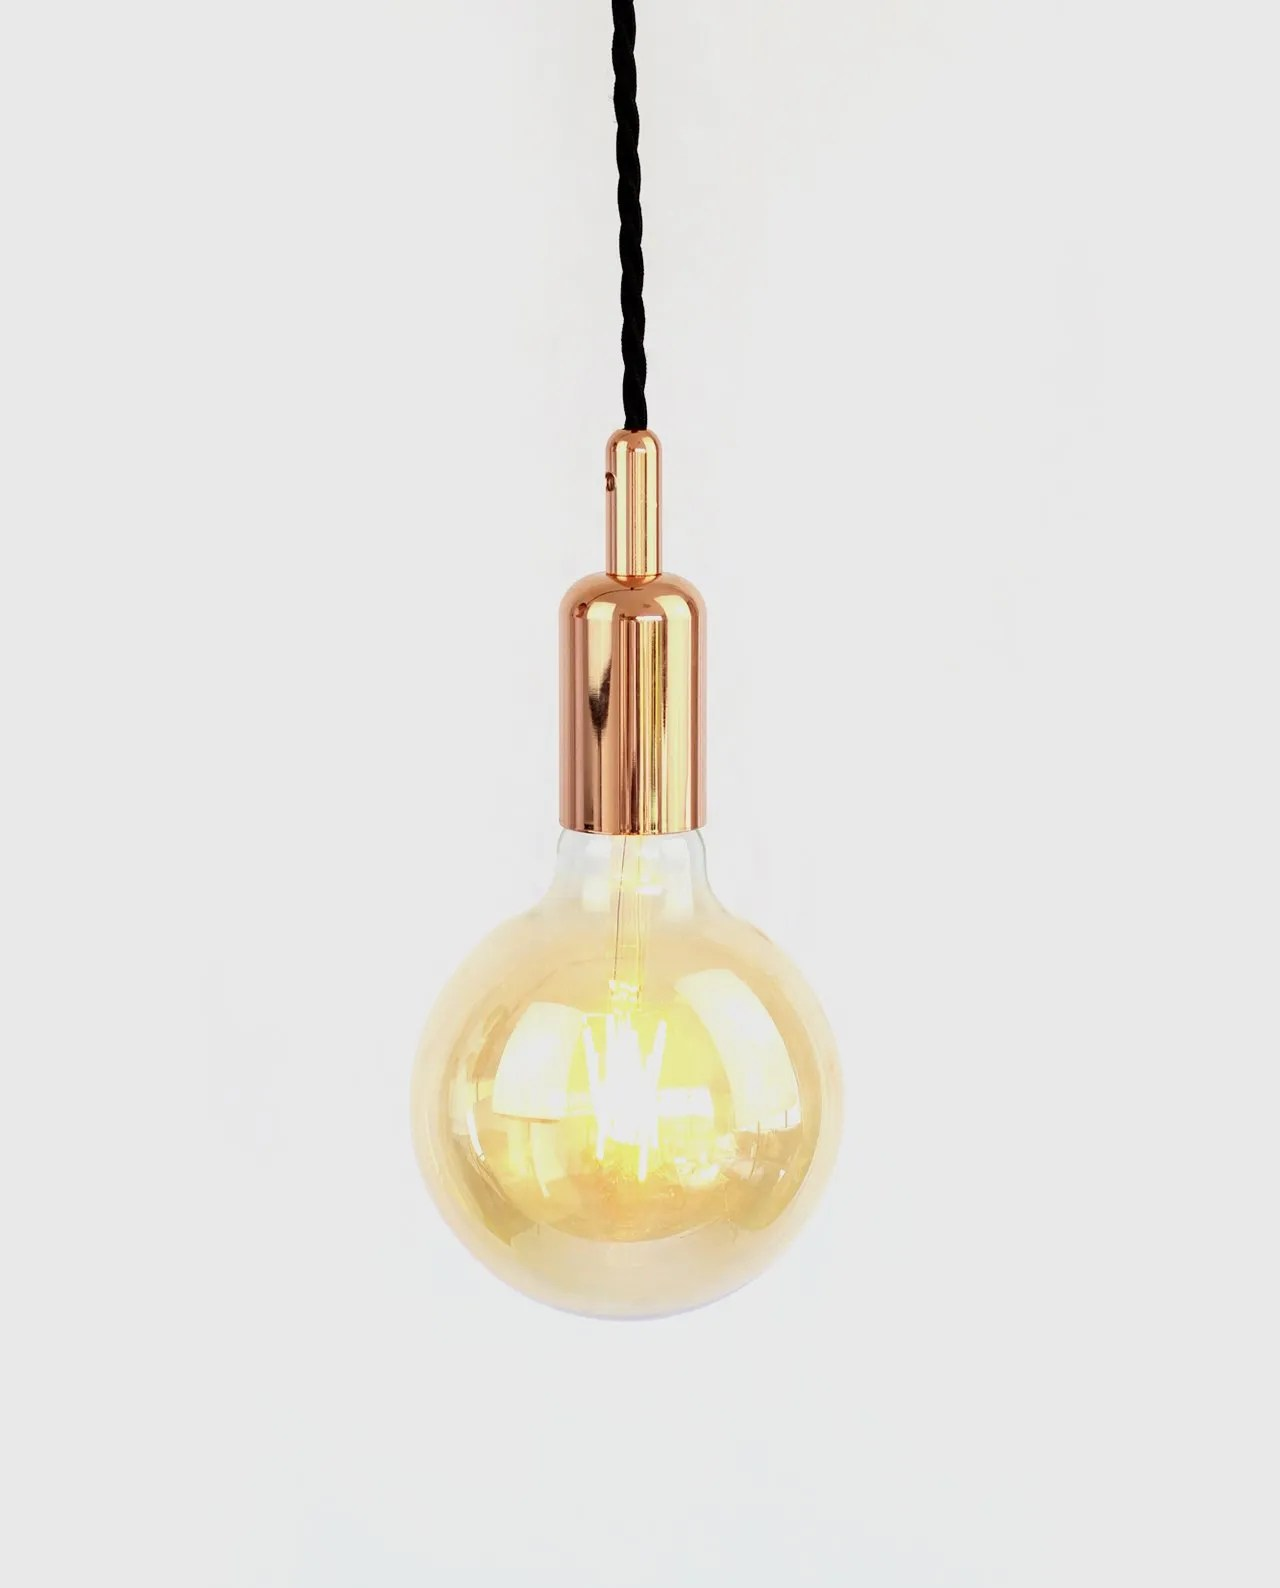 Cable Lighting Pendants